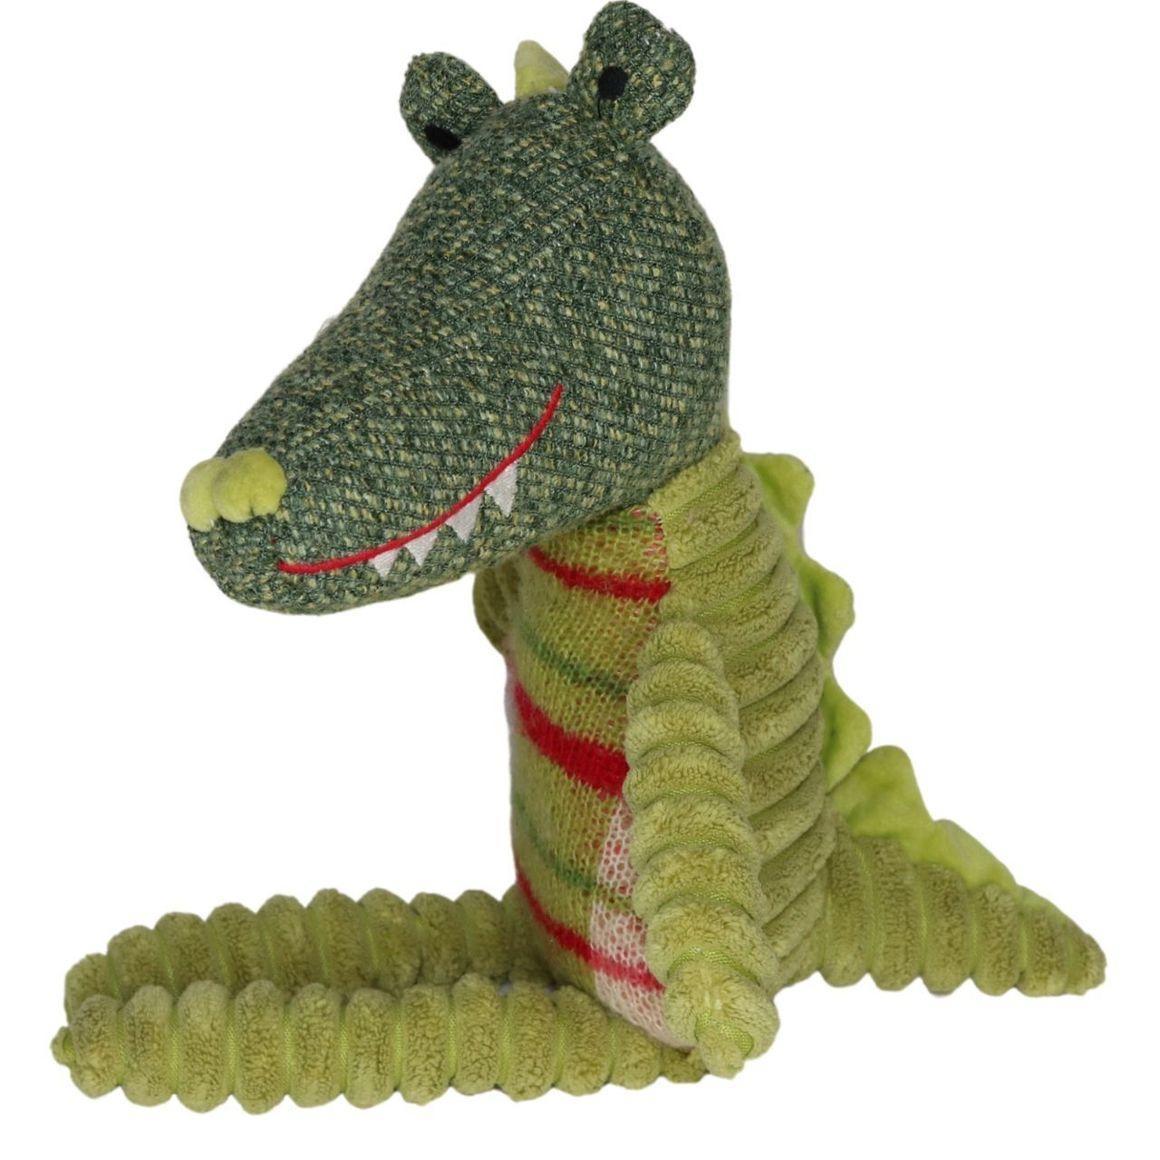 Plush Toy Crocodile - Plaid    Trada Marketplace